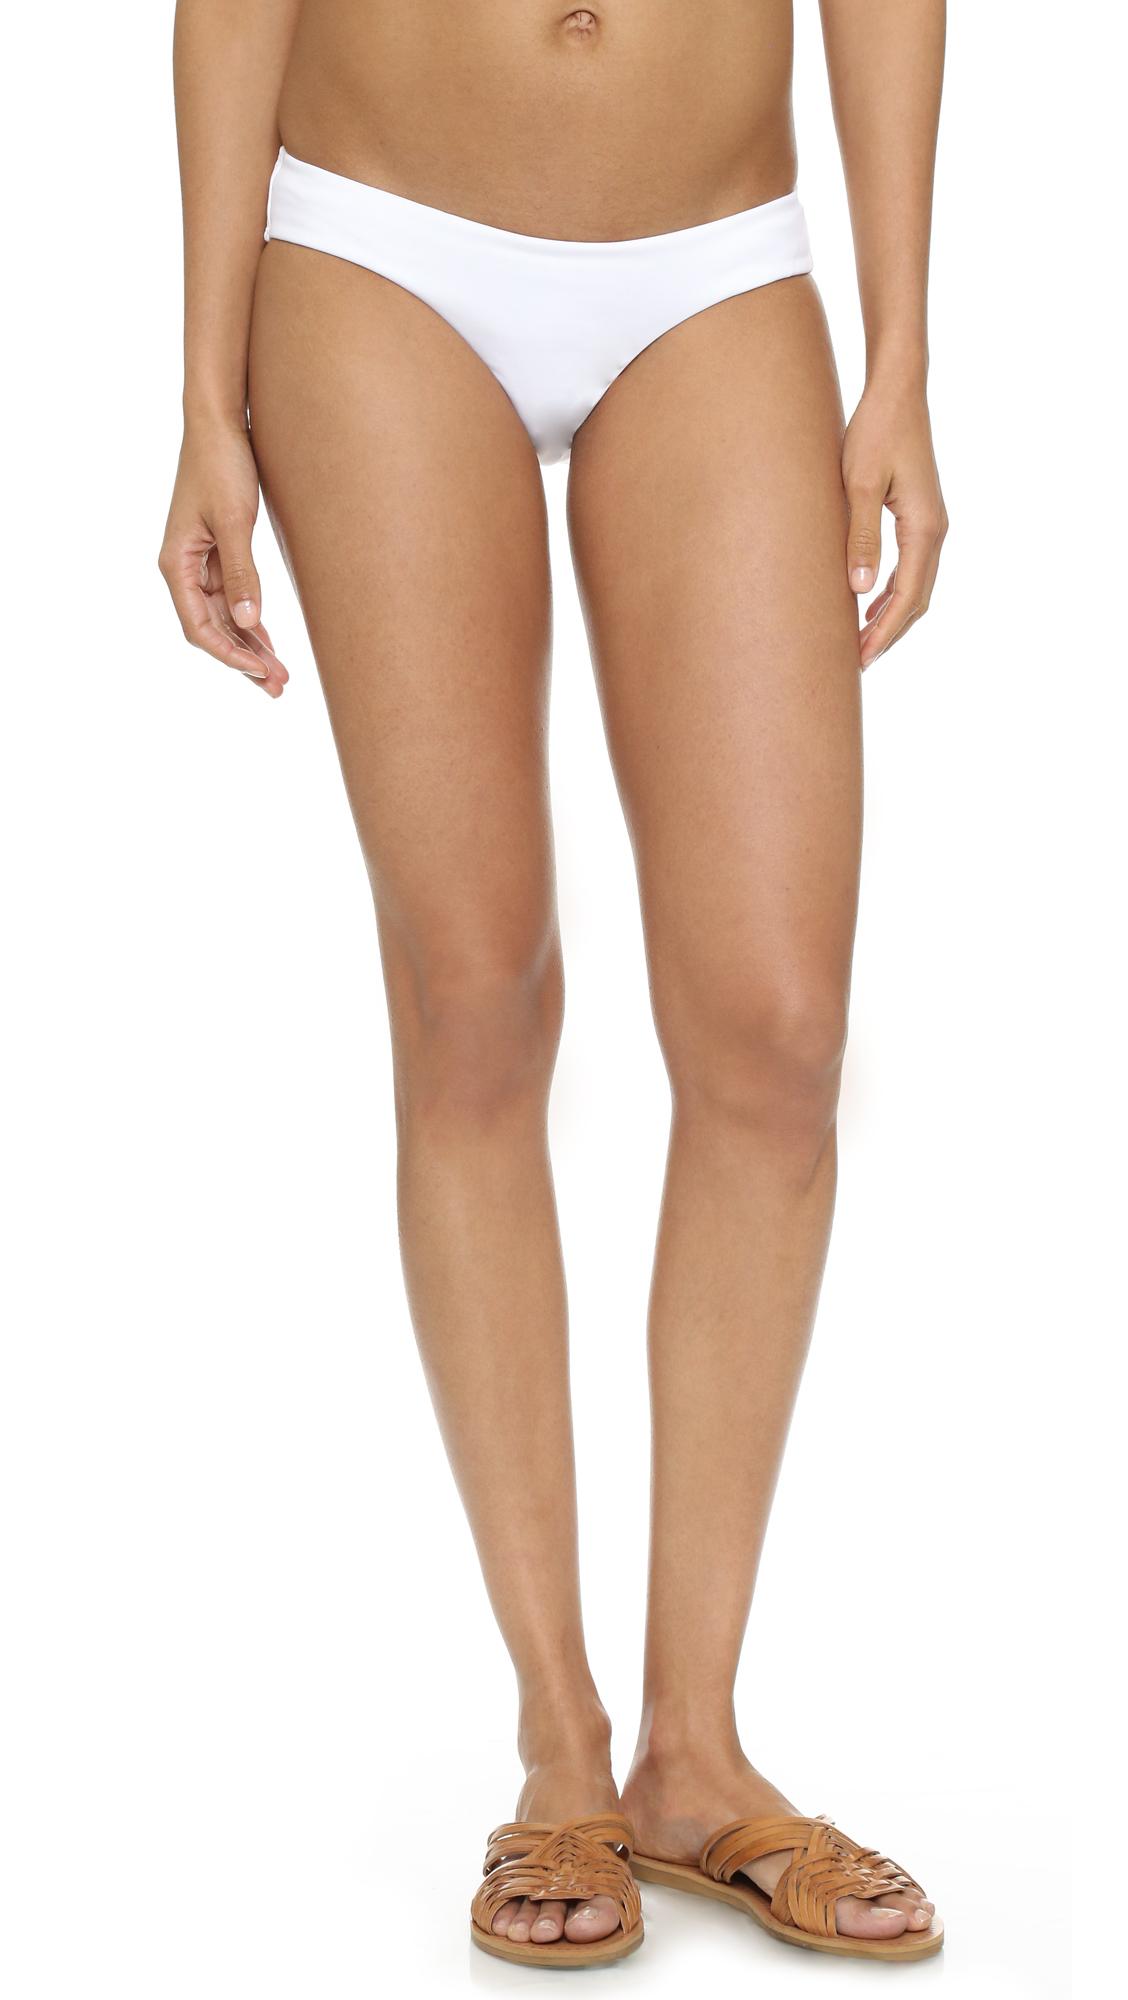 Zimmermann Flexi Bikini Bottoms - White